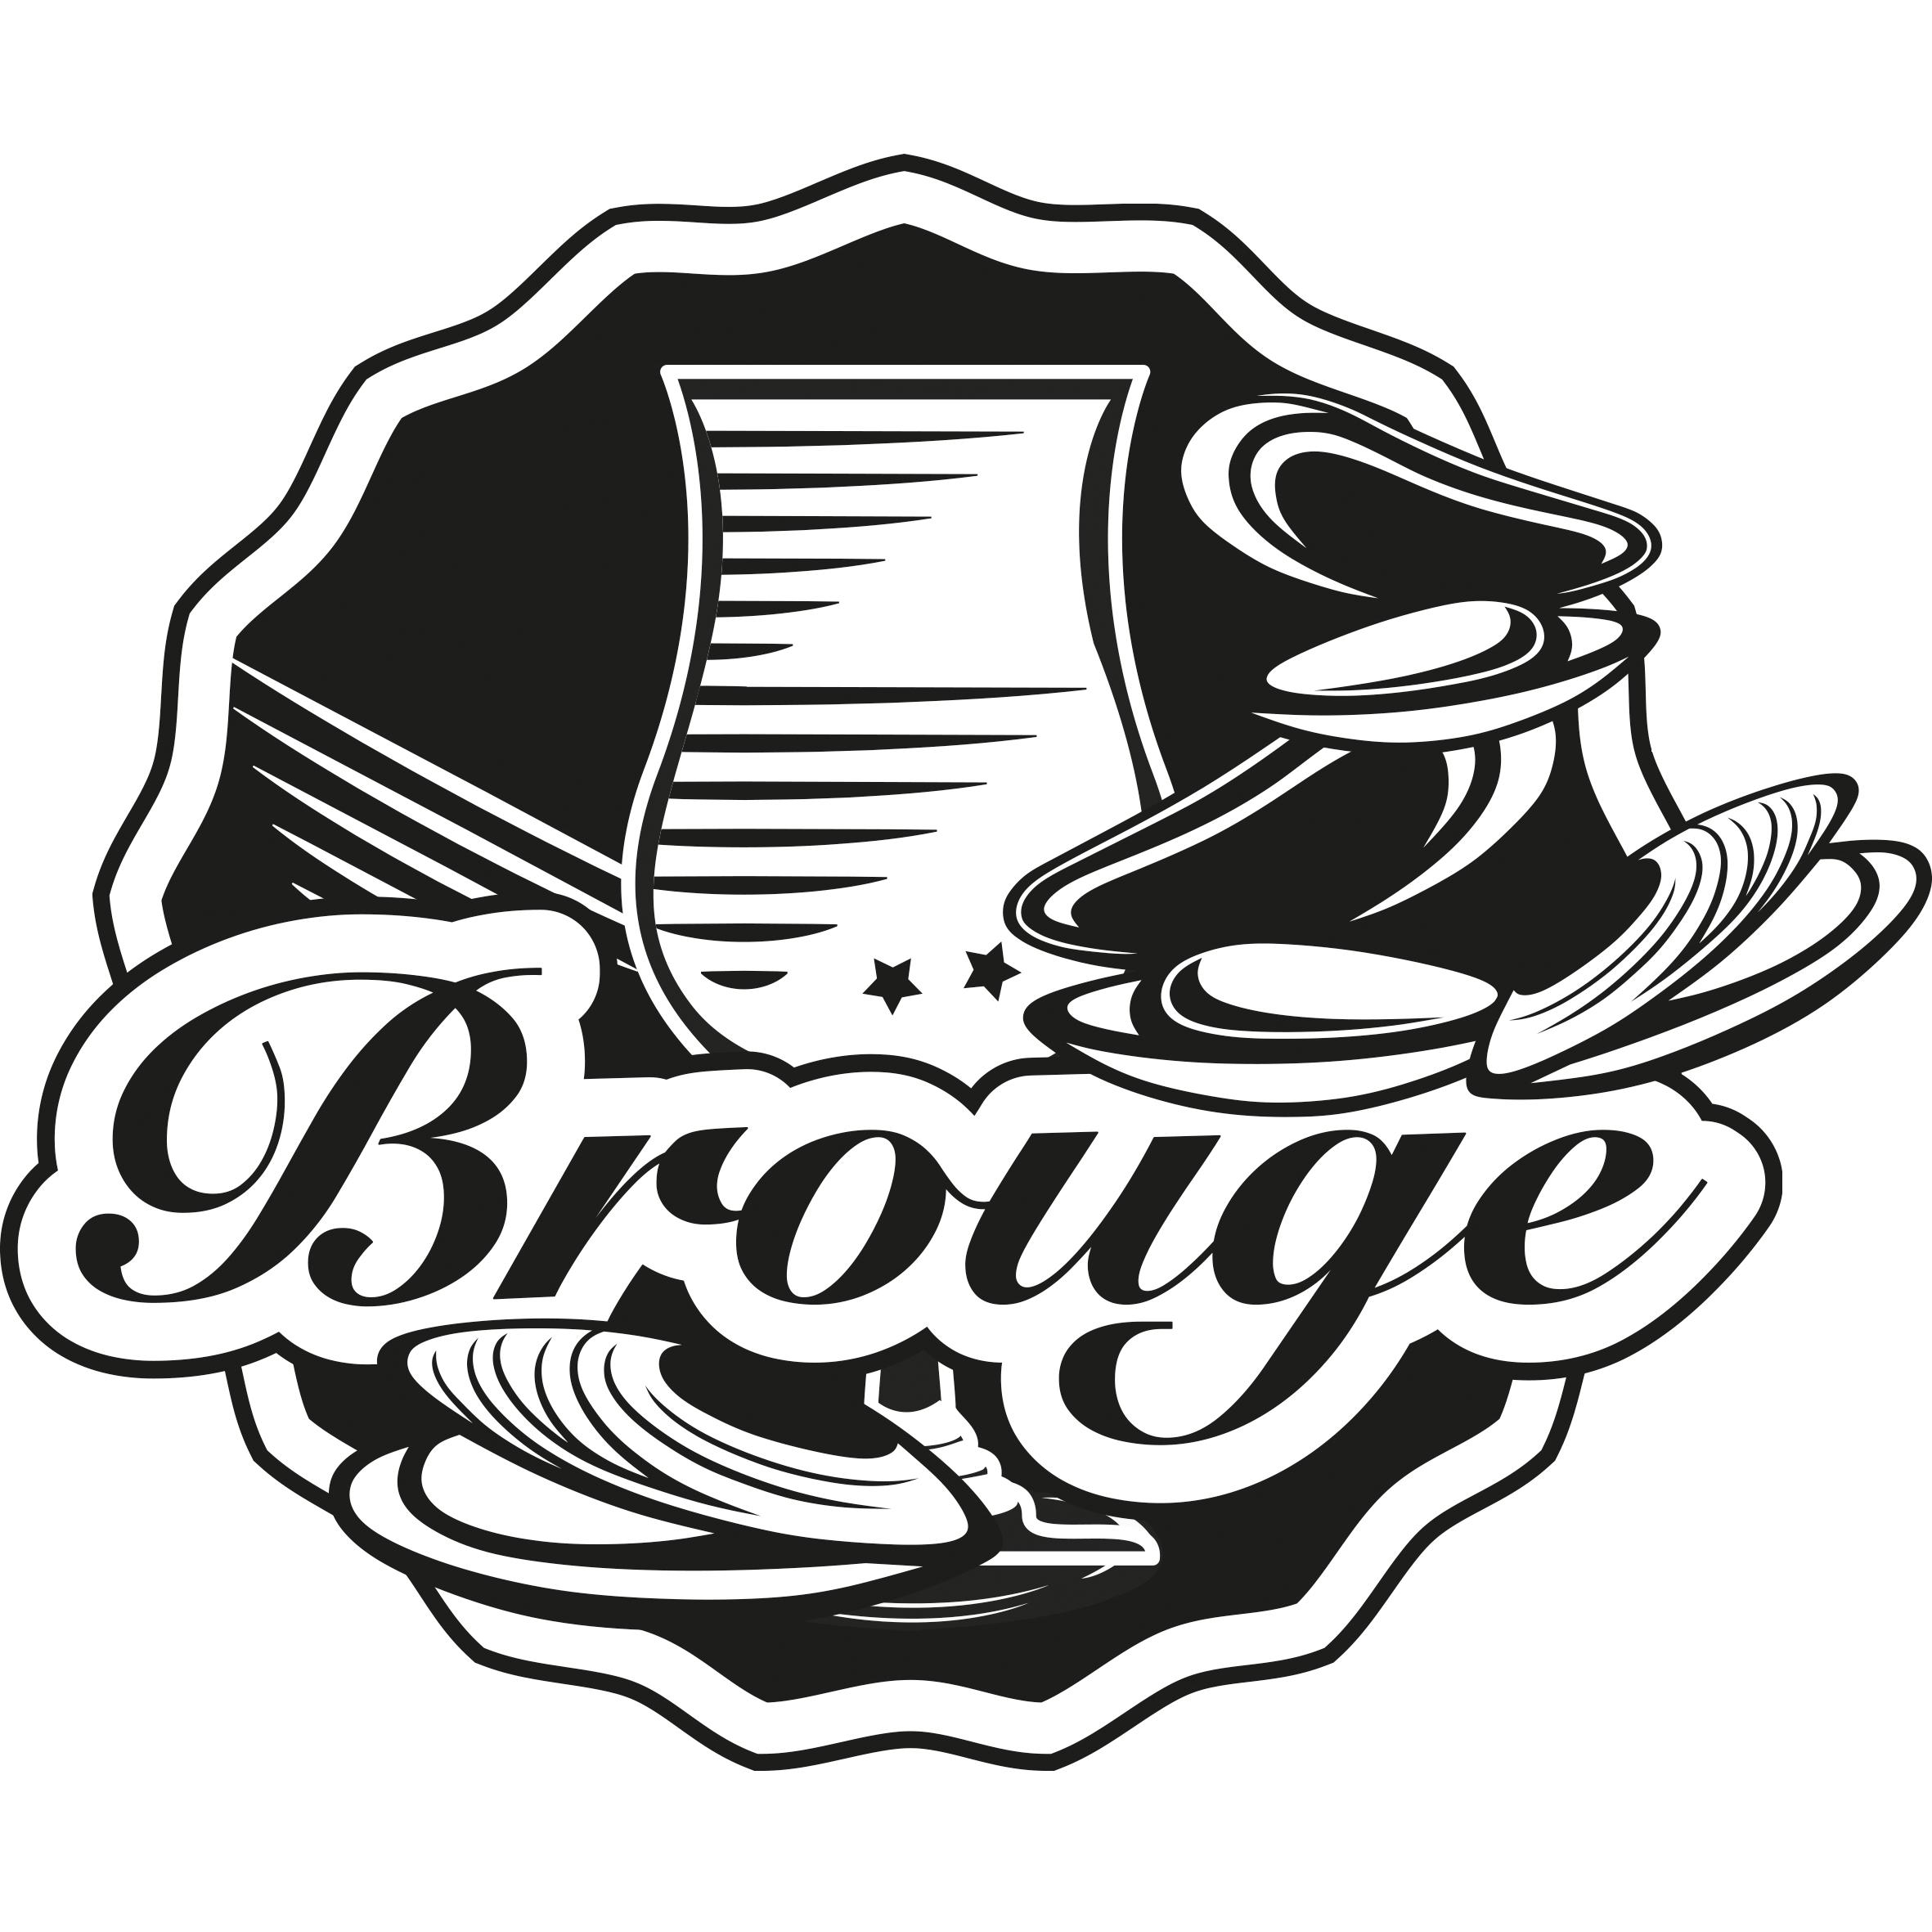 Brouge Gastropub - Twickenham 020 8977 2698